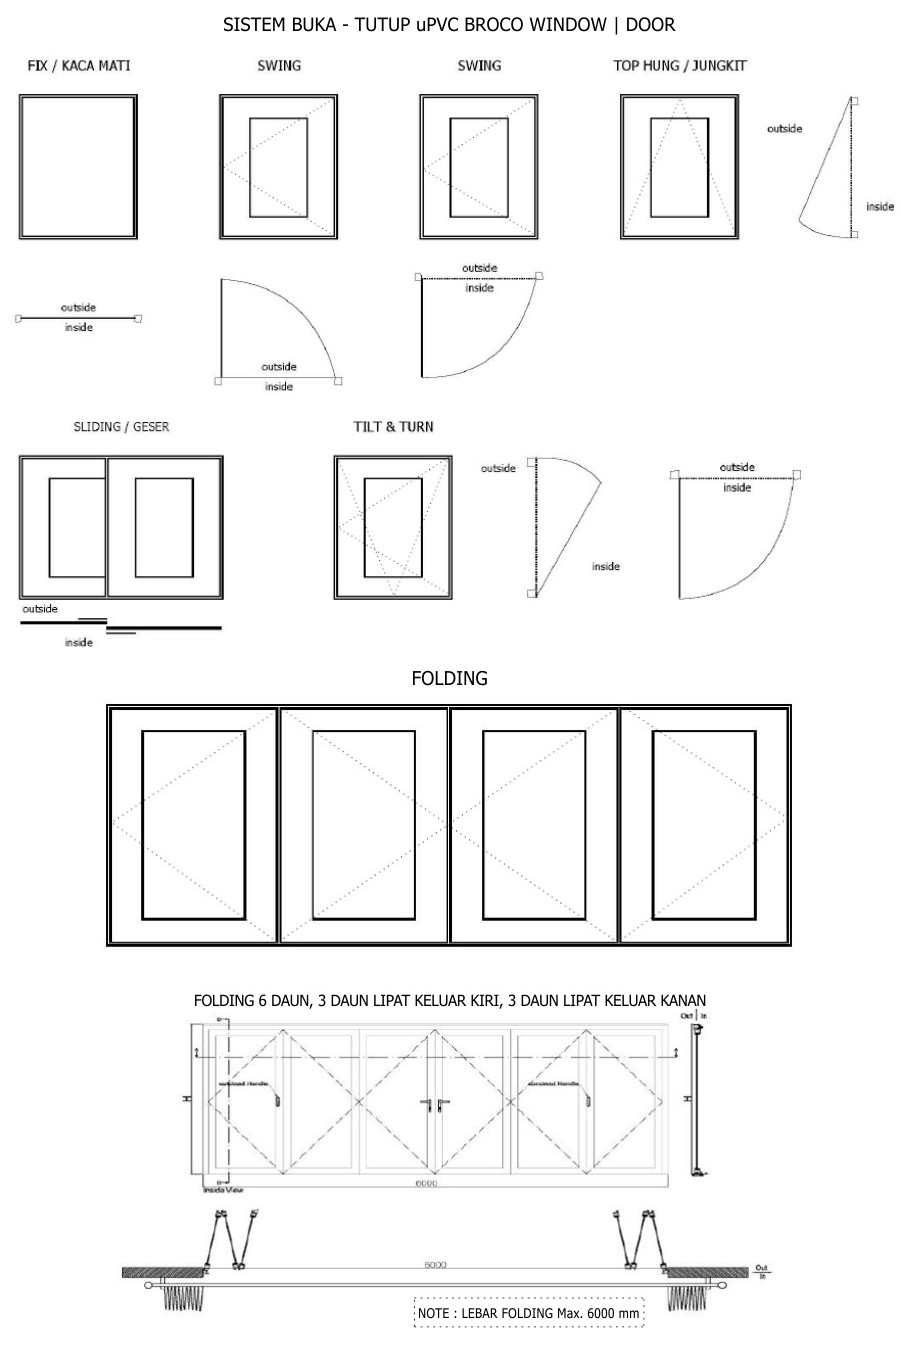 uPVC Broco - Sistem Buka Tutup